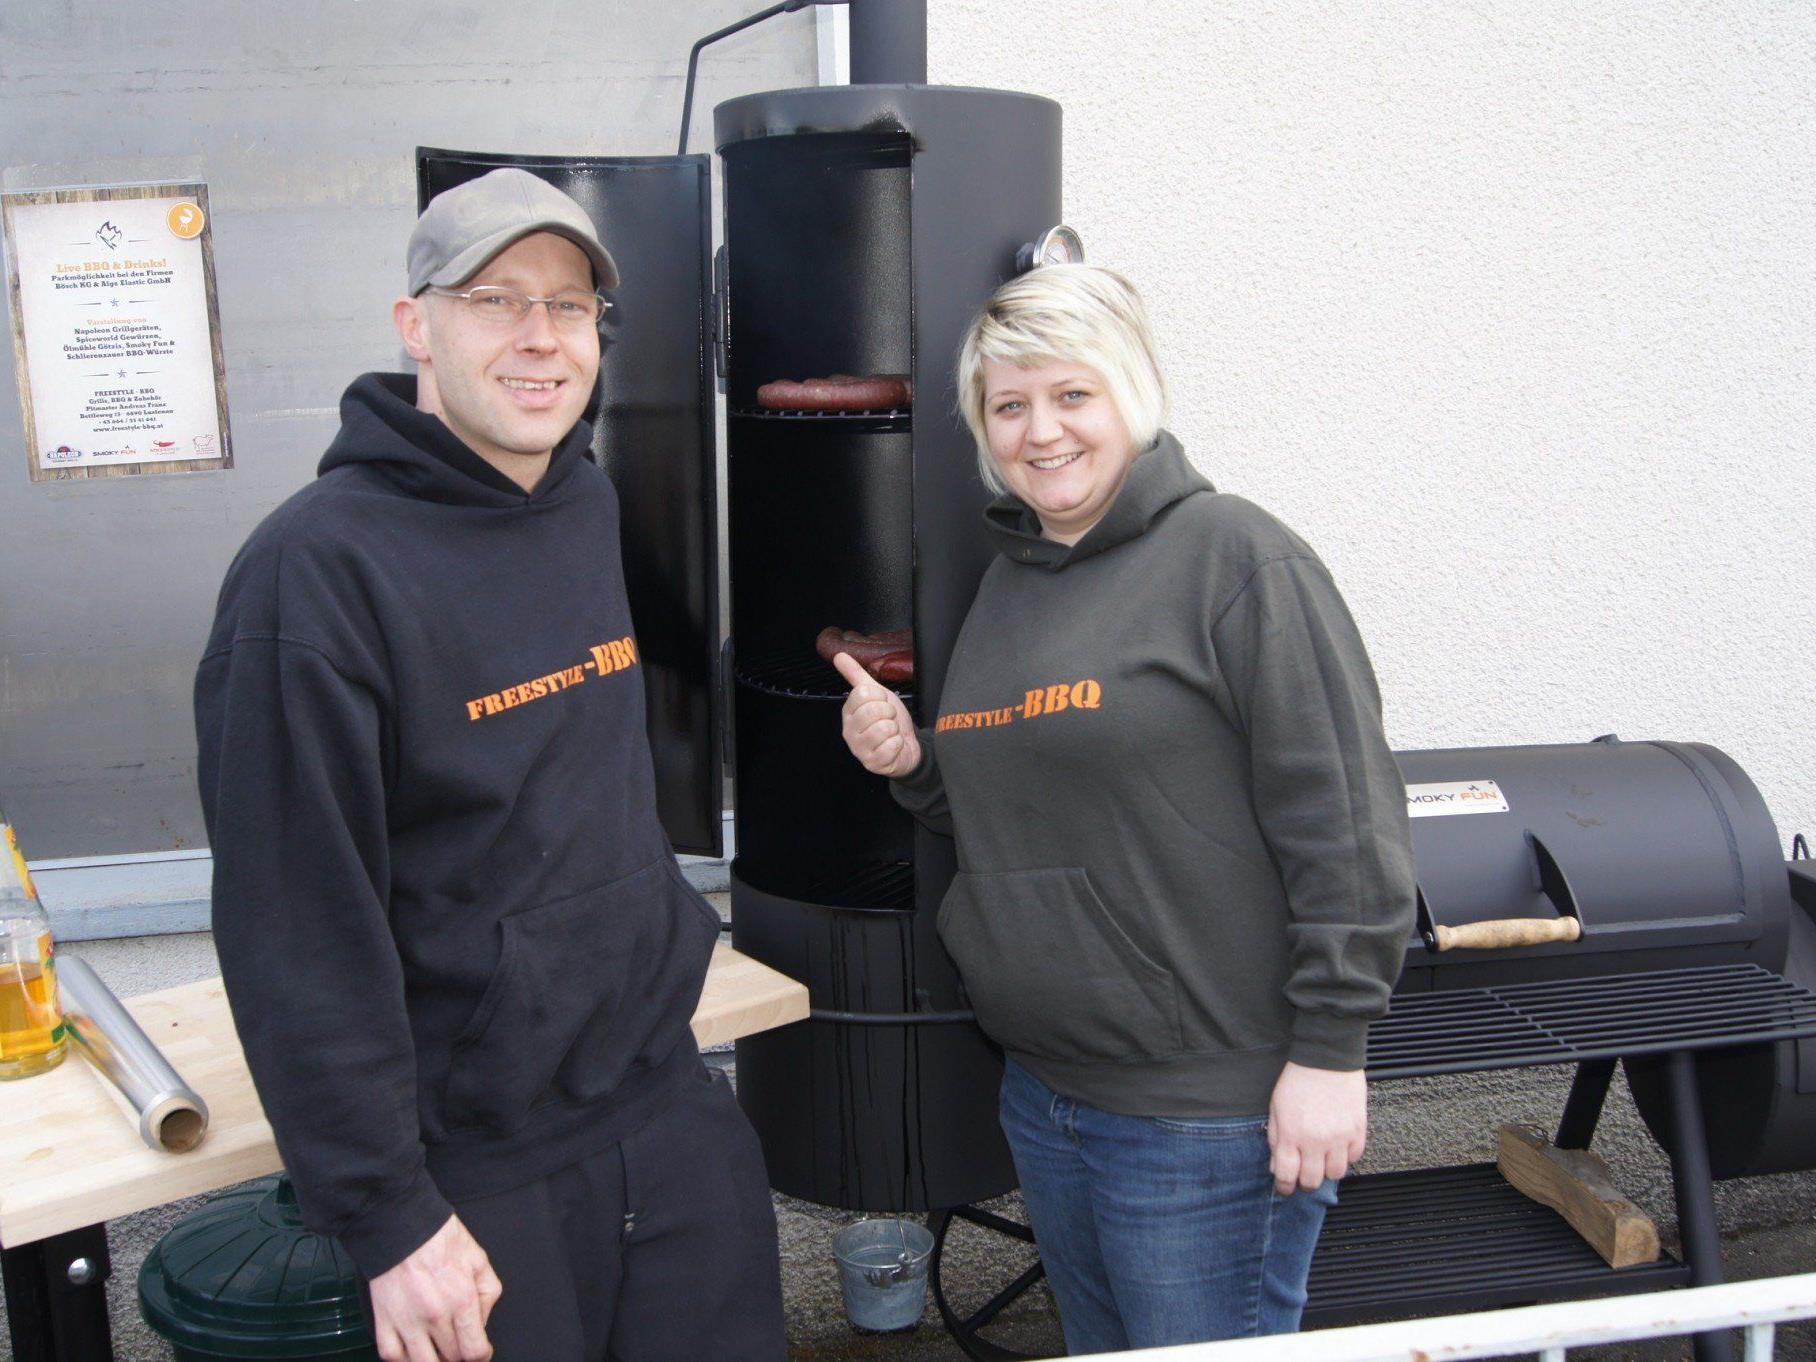 Pitmaster Andreas Franz mit Freundin Andrea Martin (Massagepraxis) bei der Eröffnung.